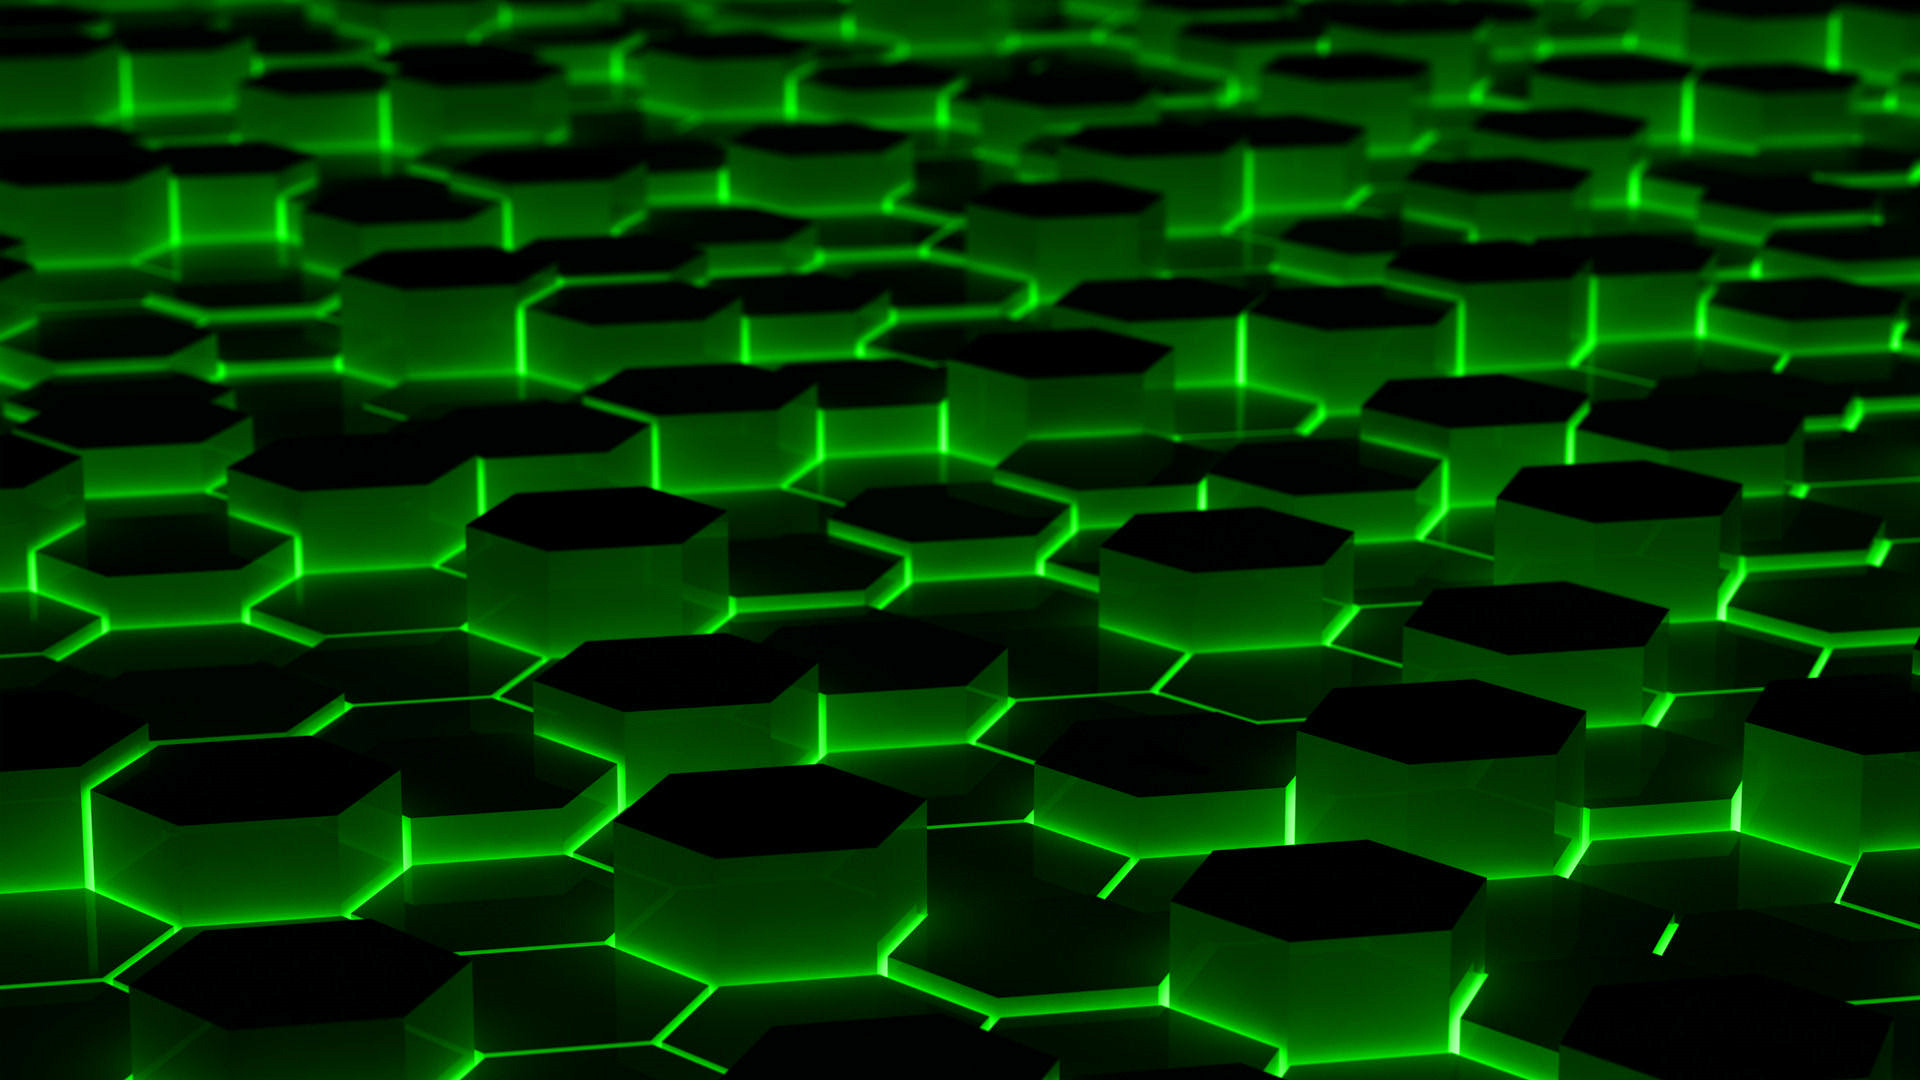 Tags: neon, dark, green